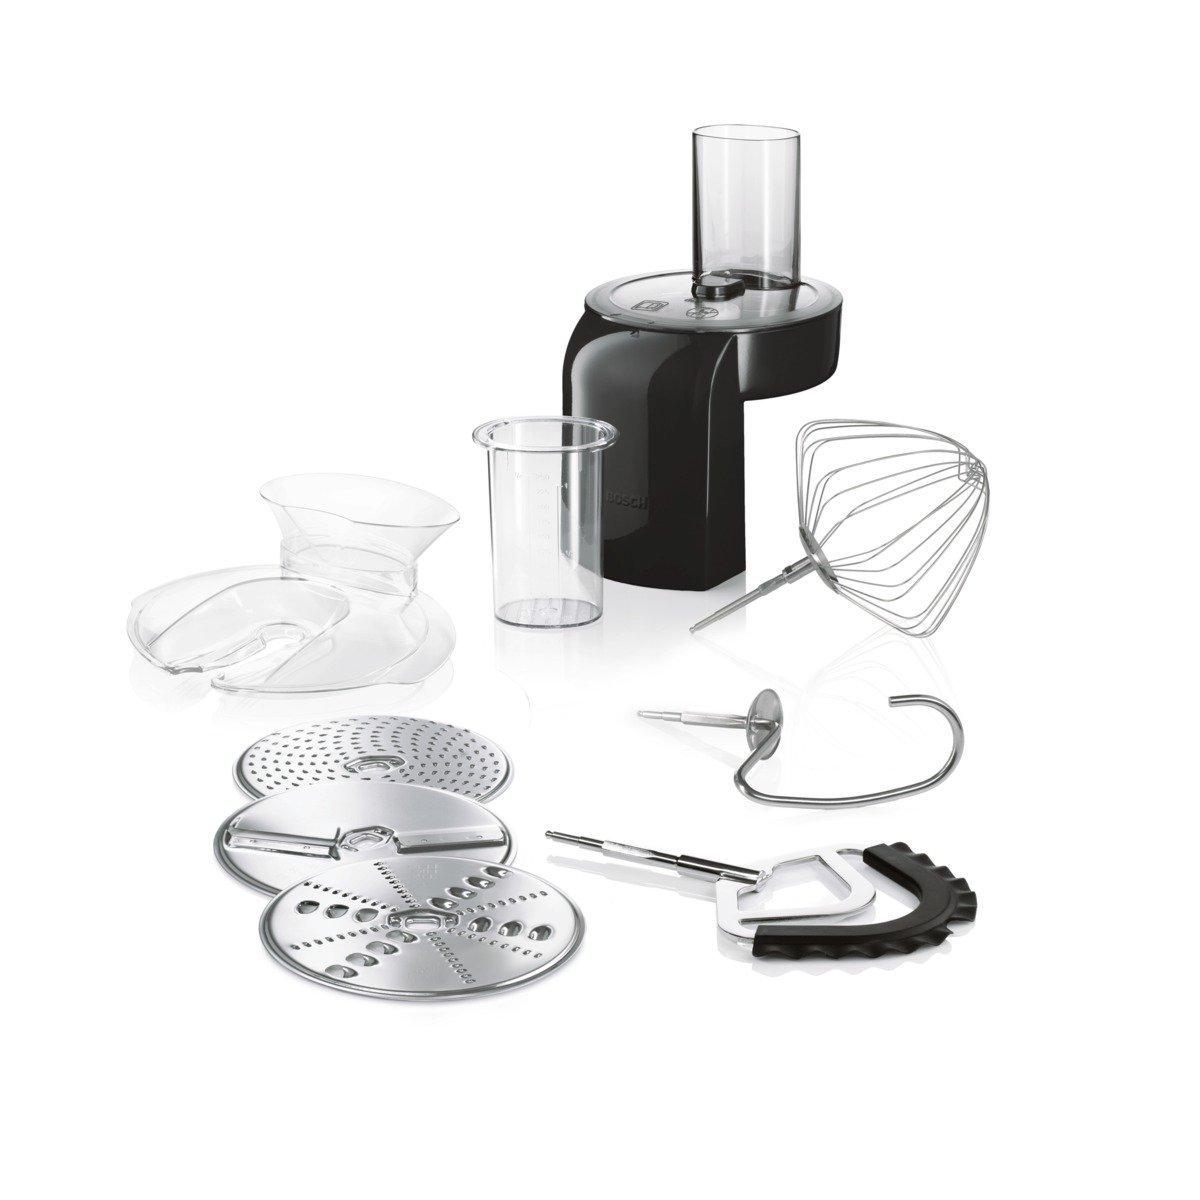 Bosch MUMX30GXDE robot de cocina, 1600 W, 5.4 litros, Acero Inoxidable, Gris: Amazon.es: Hogar